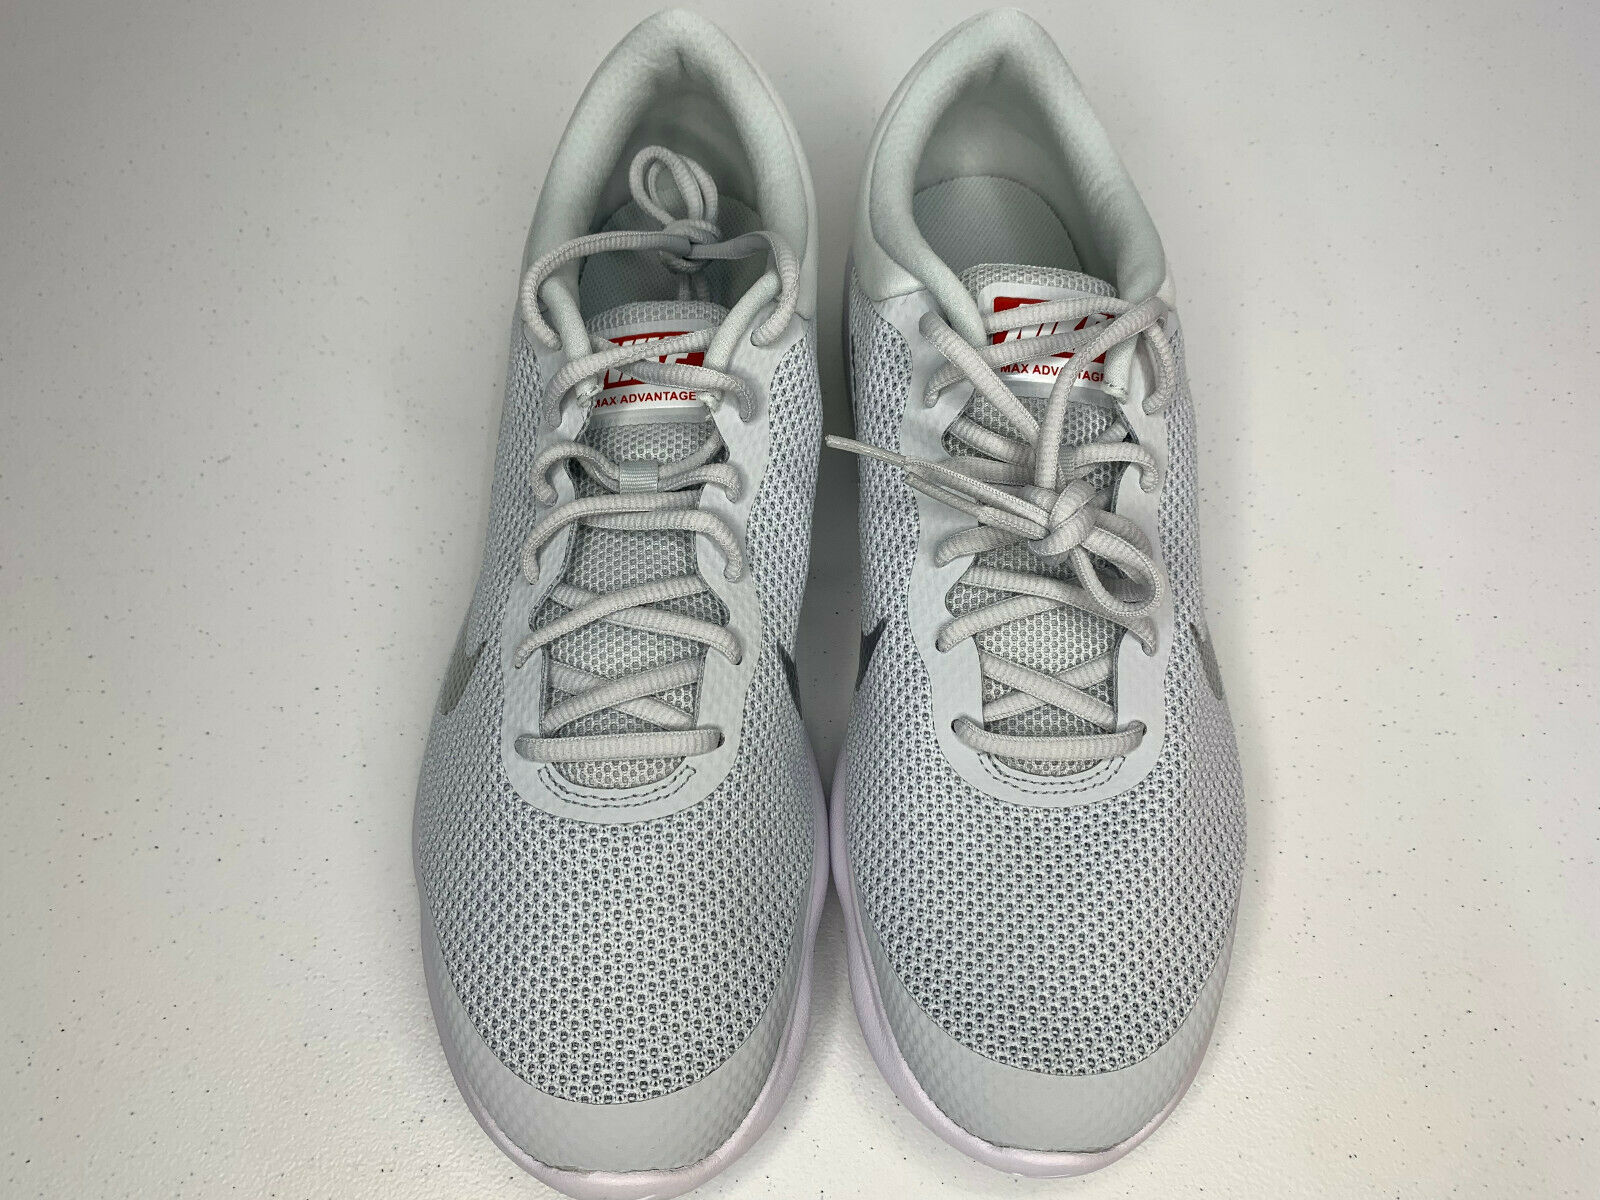 NIB SIZE 15 MEN Nike Air Max Advantage Running Shoes Platinum White Trainer NEW  image 2